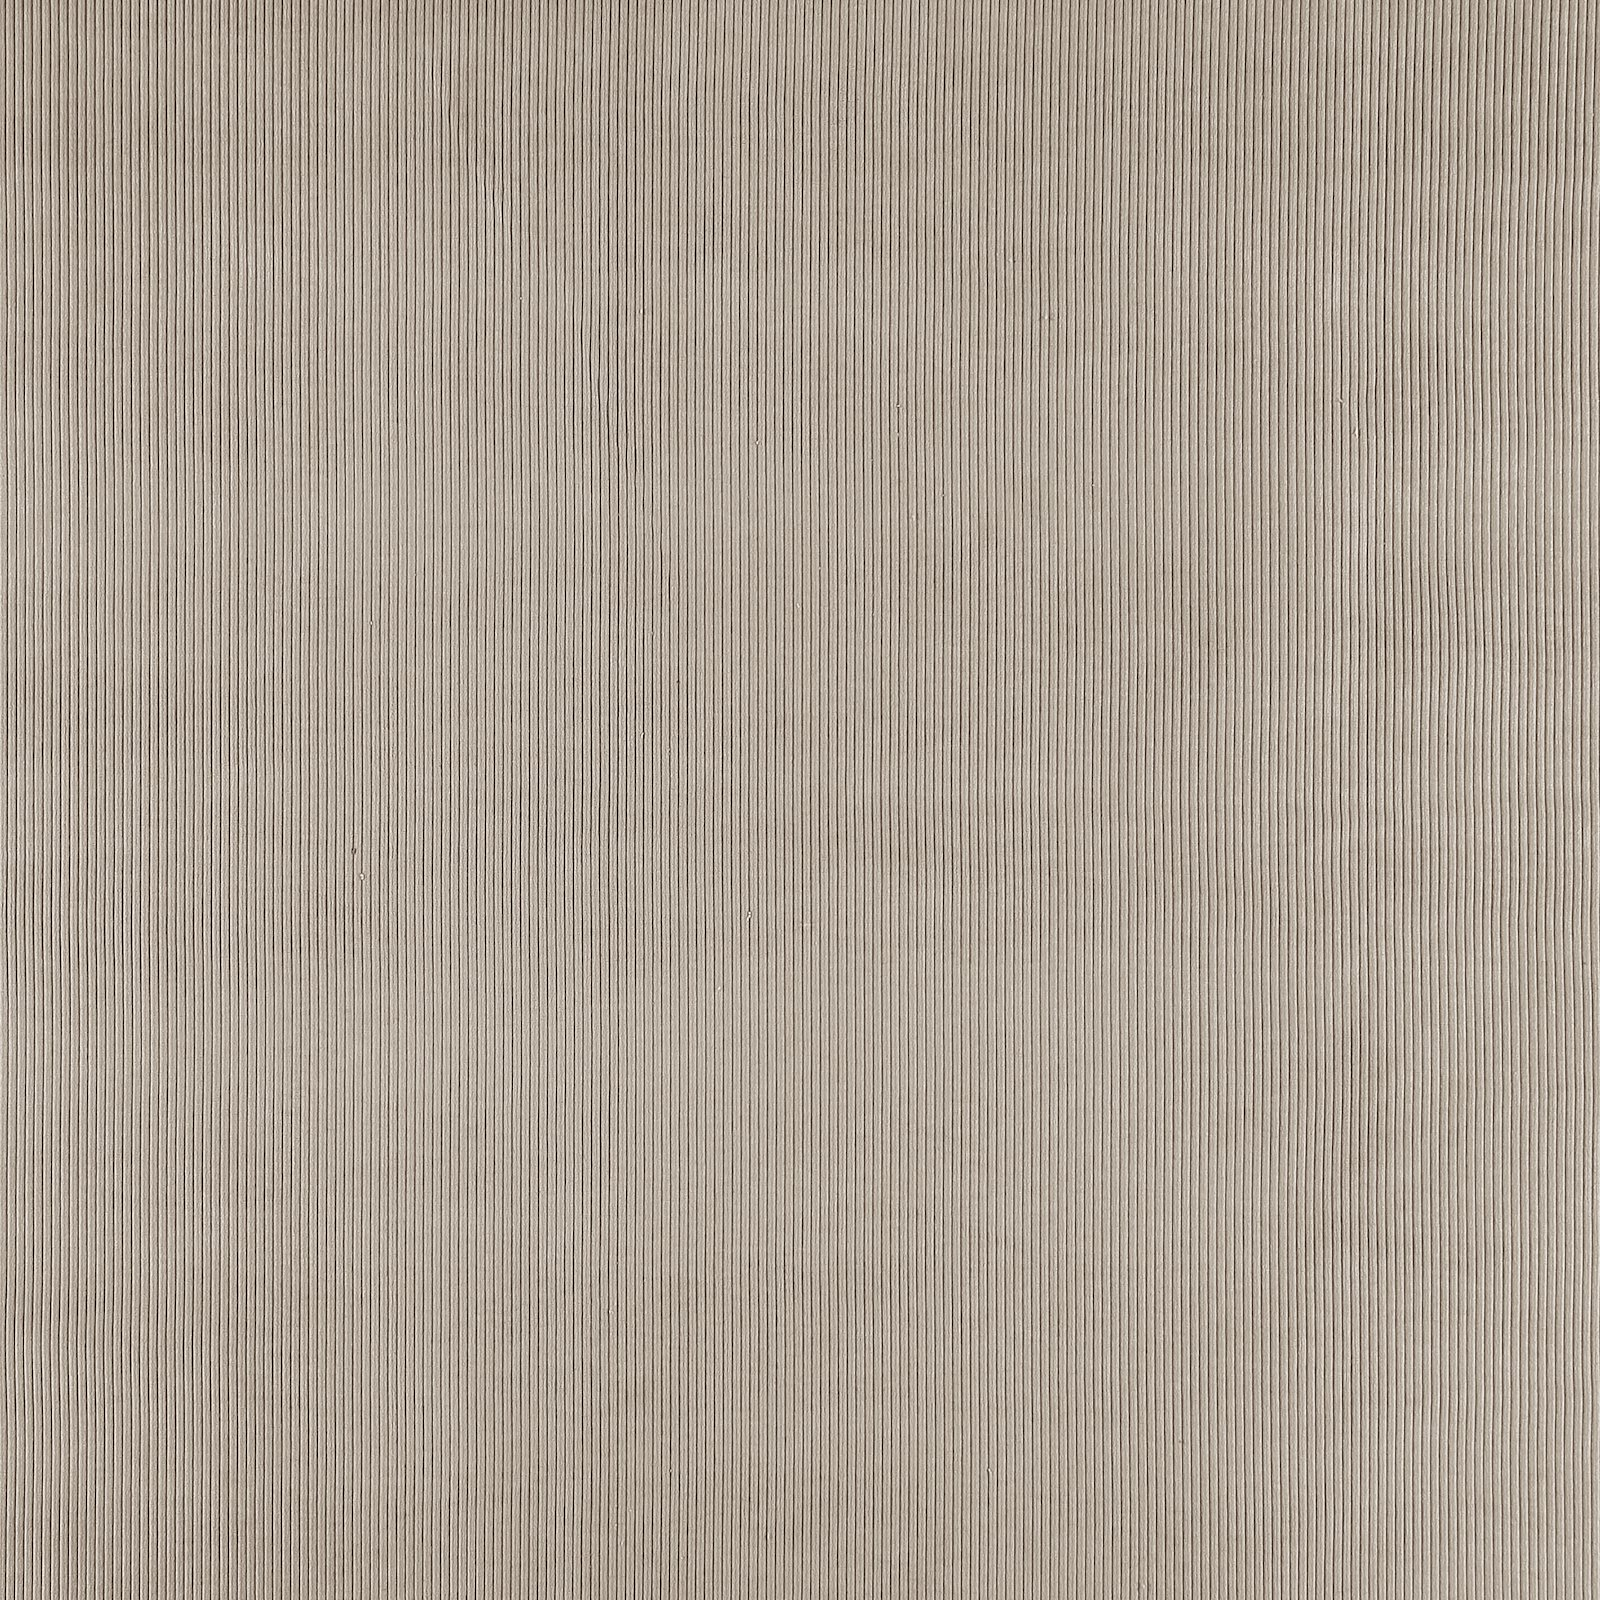 Upholstery corduroy 6 wales beige 823811_pack_solid